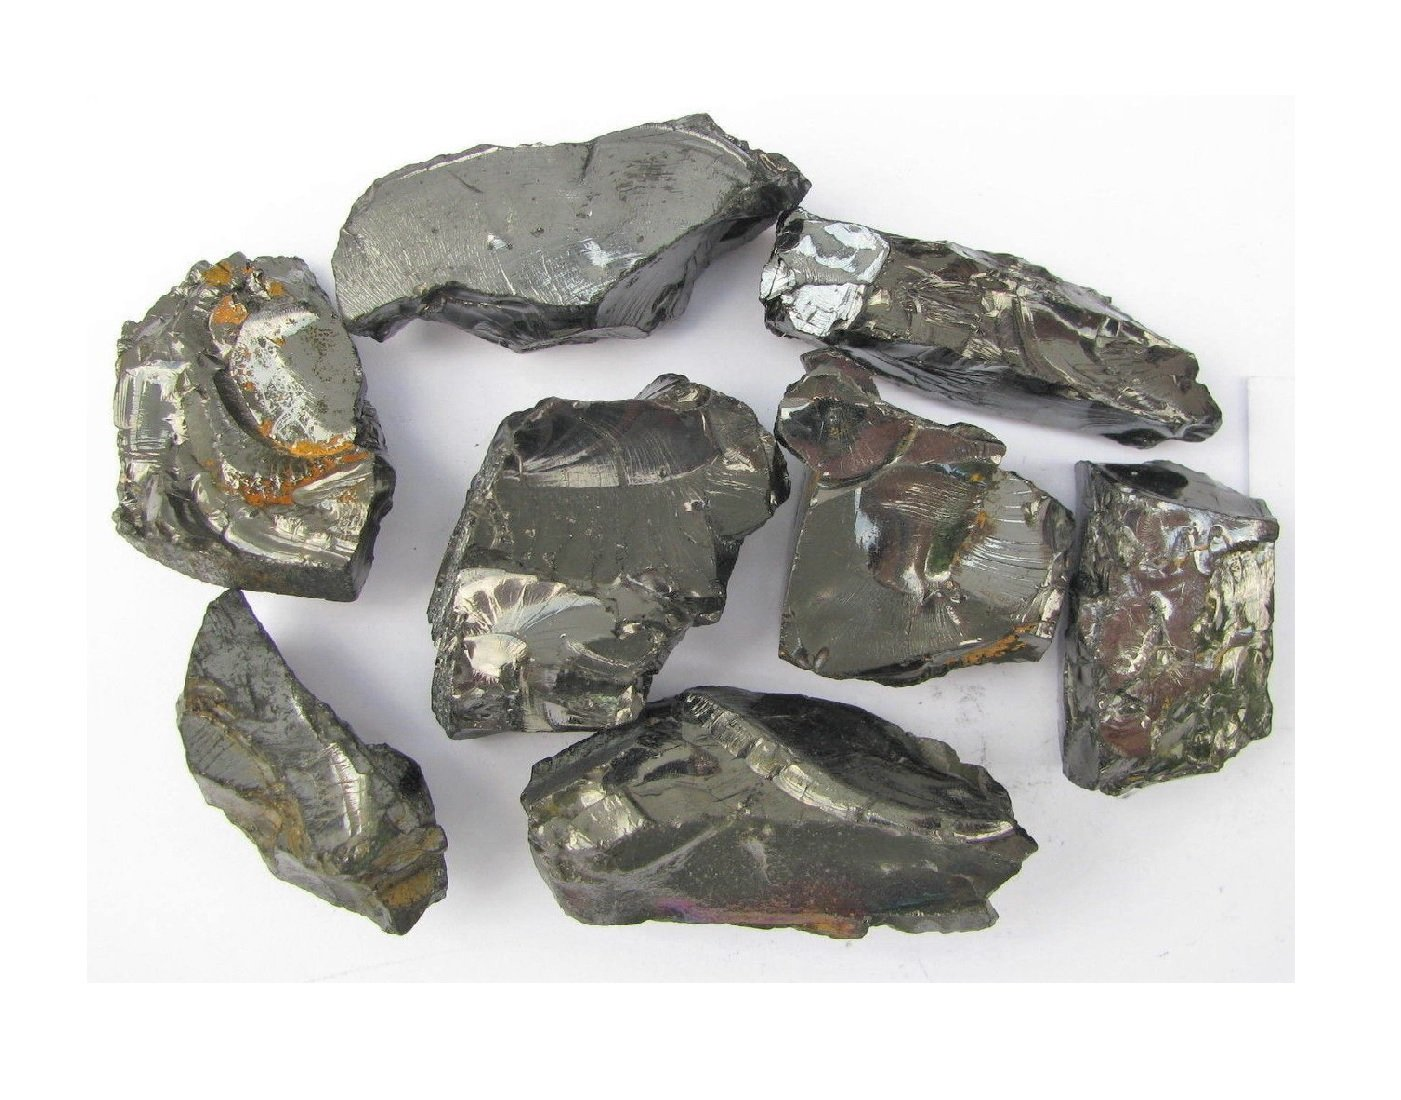 Karelian Heritage Elite Silver Shungite 0 2 lb (100 Grams) Set for Water  Purification (40-60 mm Stones) ES99